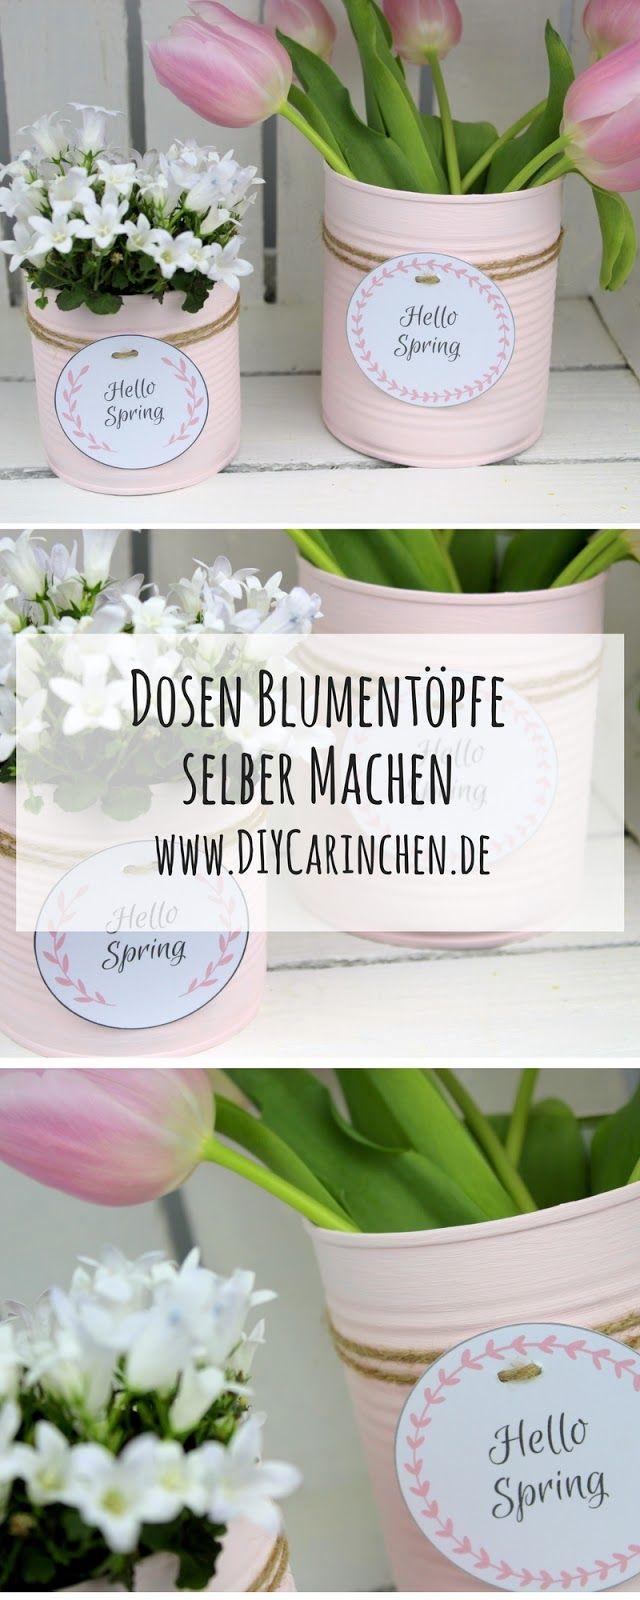 Photo of Gjenvinning av DIY Bastelidee: Blumentopf aus einer Konservendose basteln